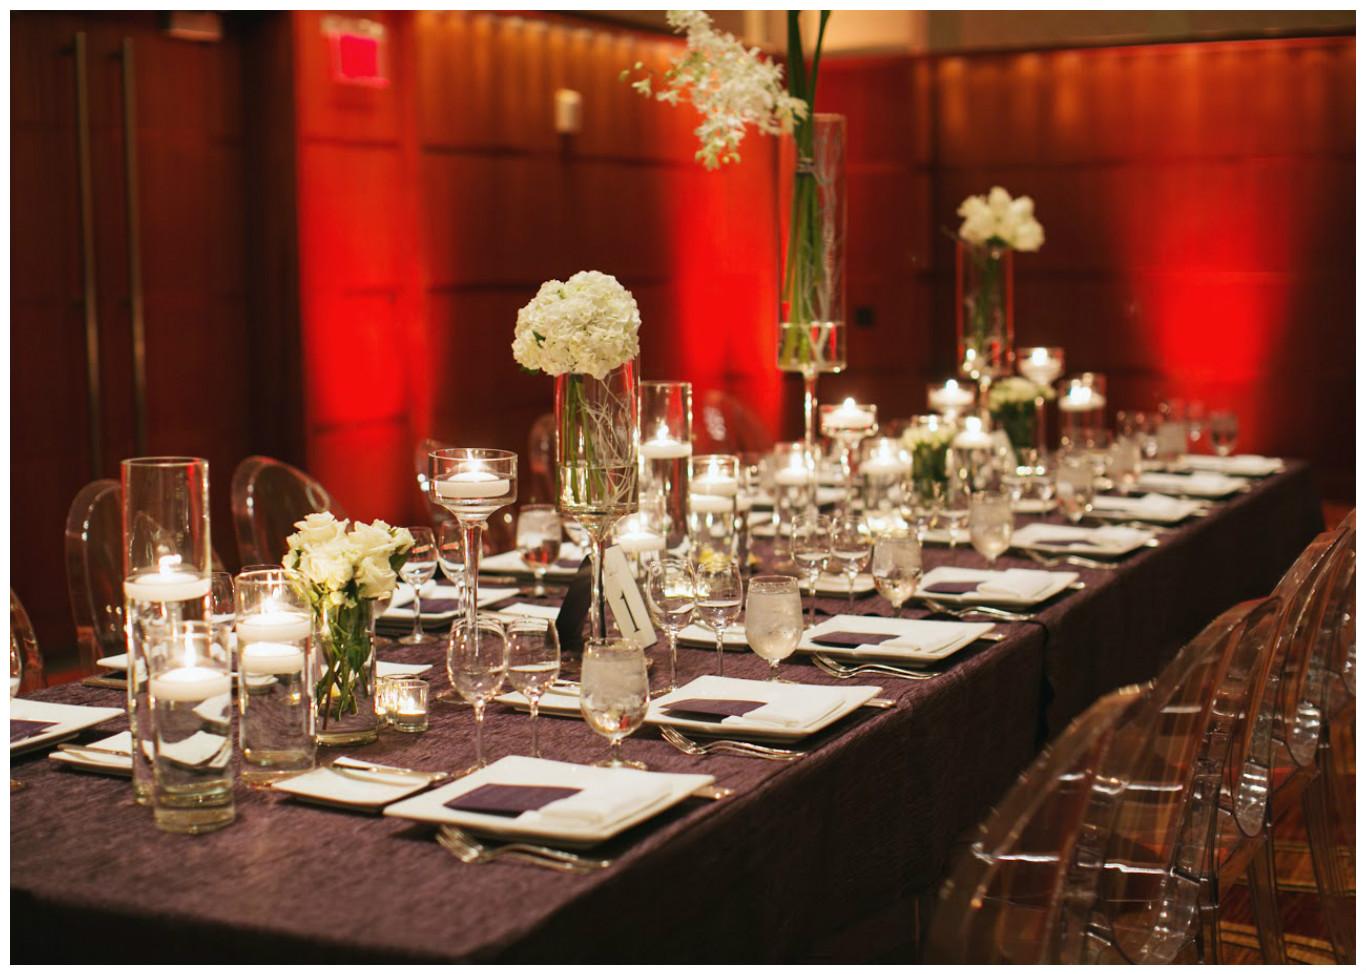 Jam Twist Table Linen with White Lamour Napkins | BBJ Linen